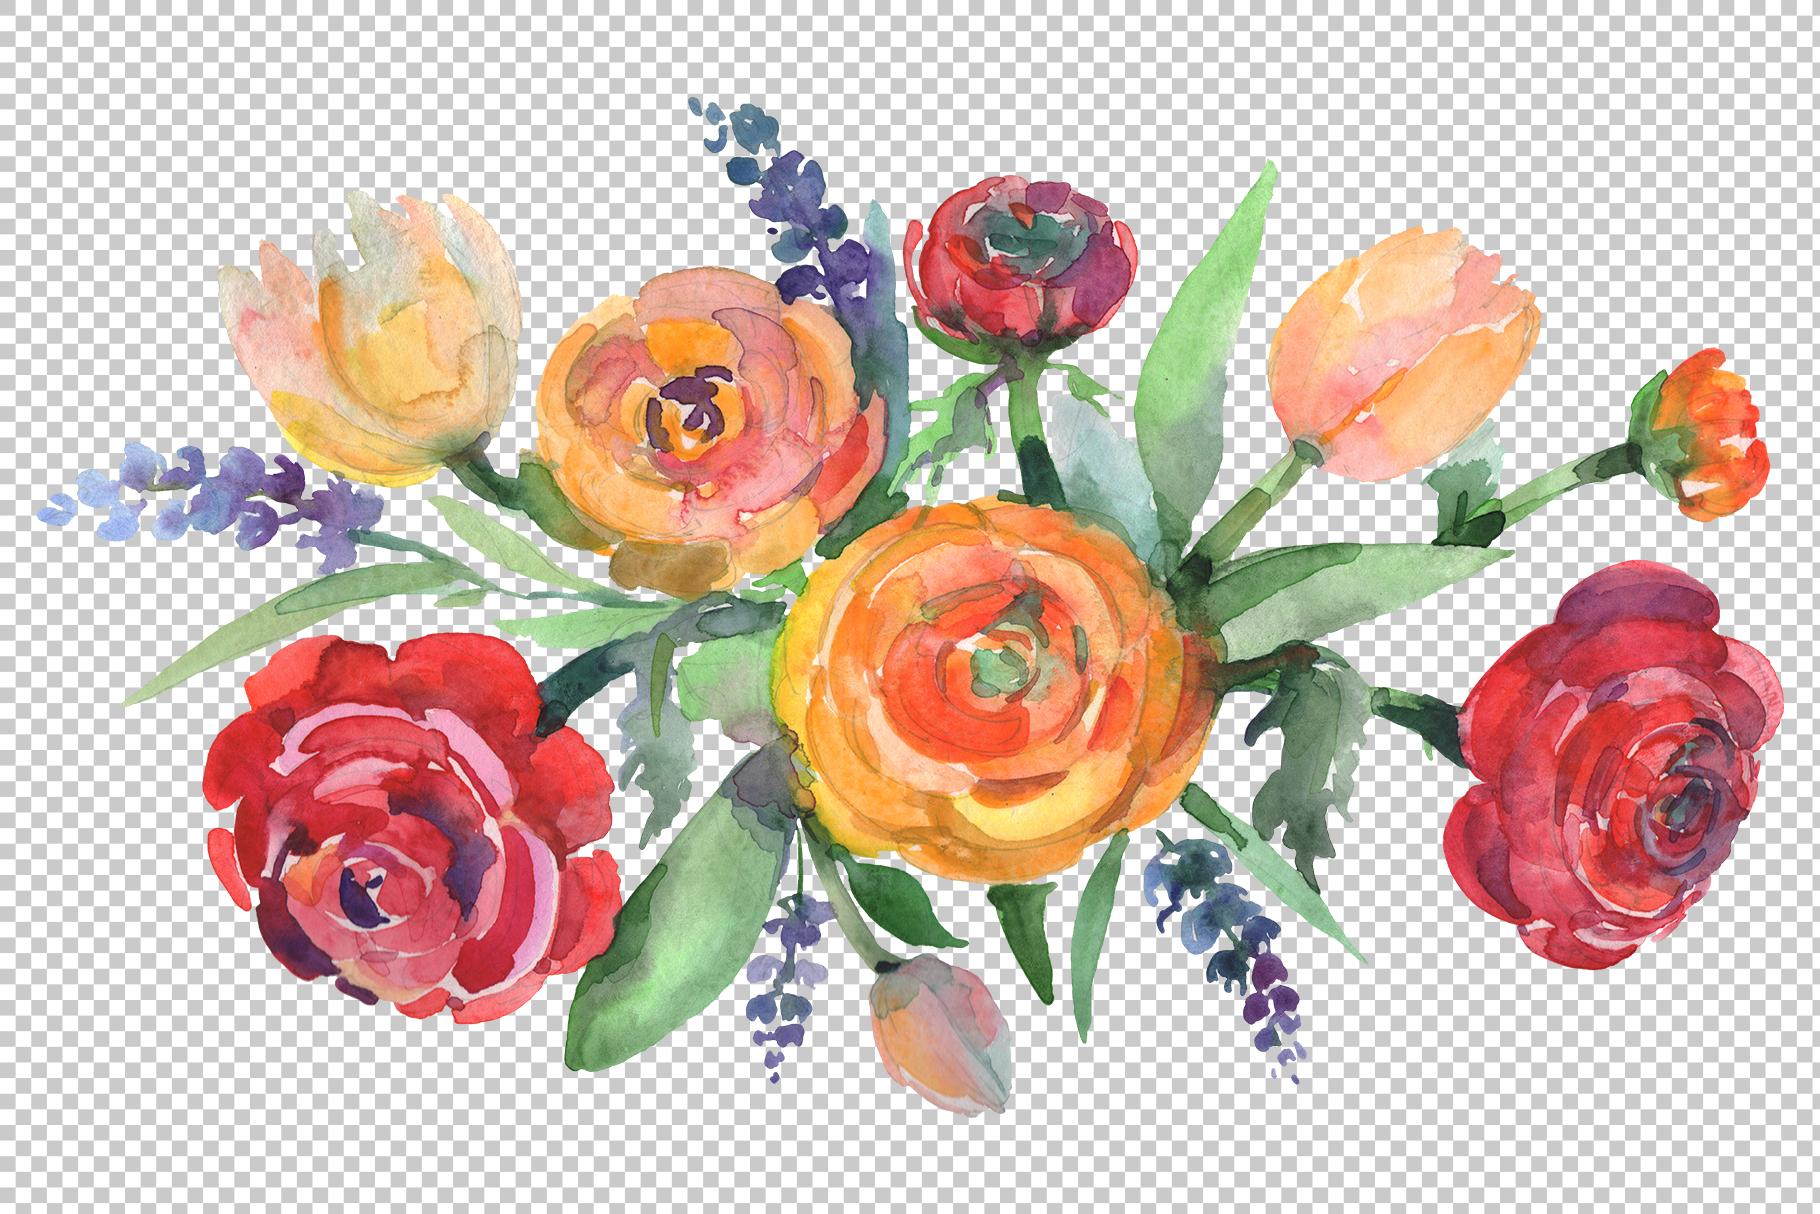 Bouquet floral waltz Watercolor png example image 2